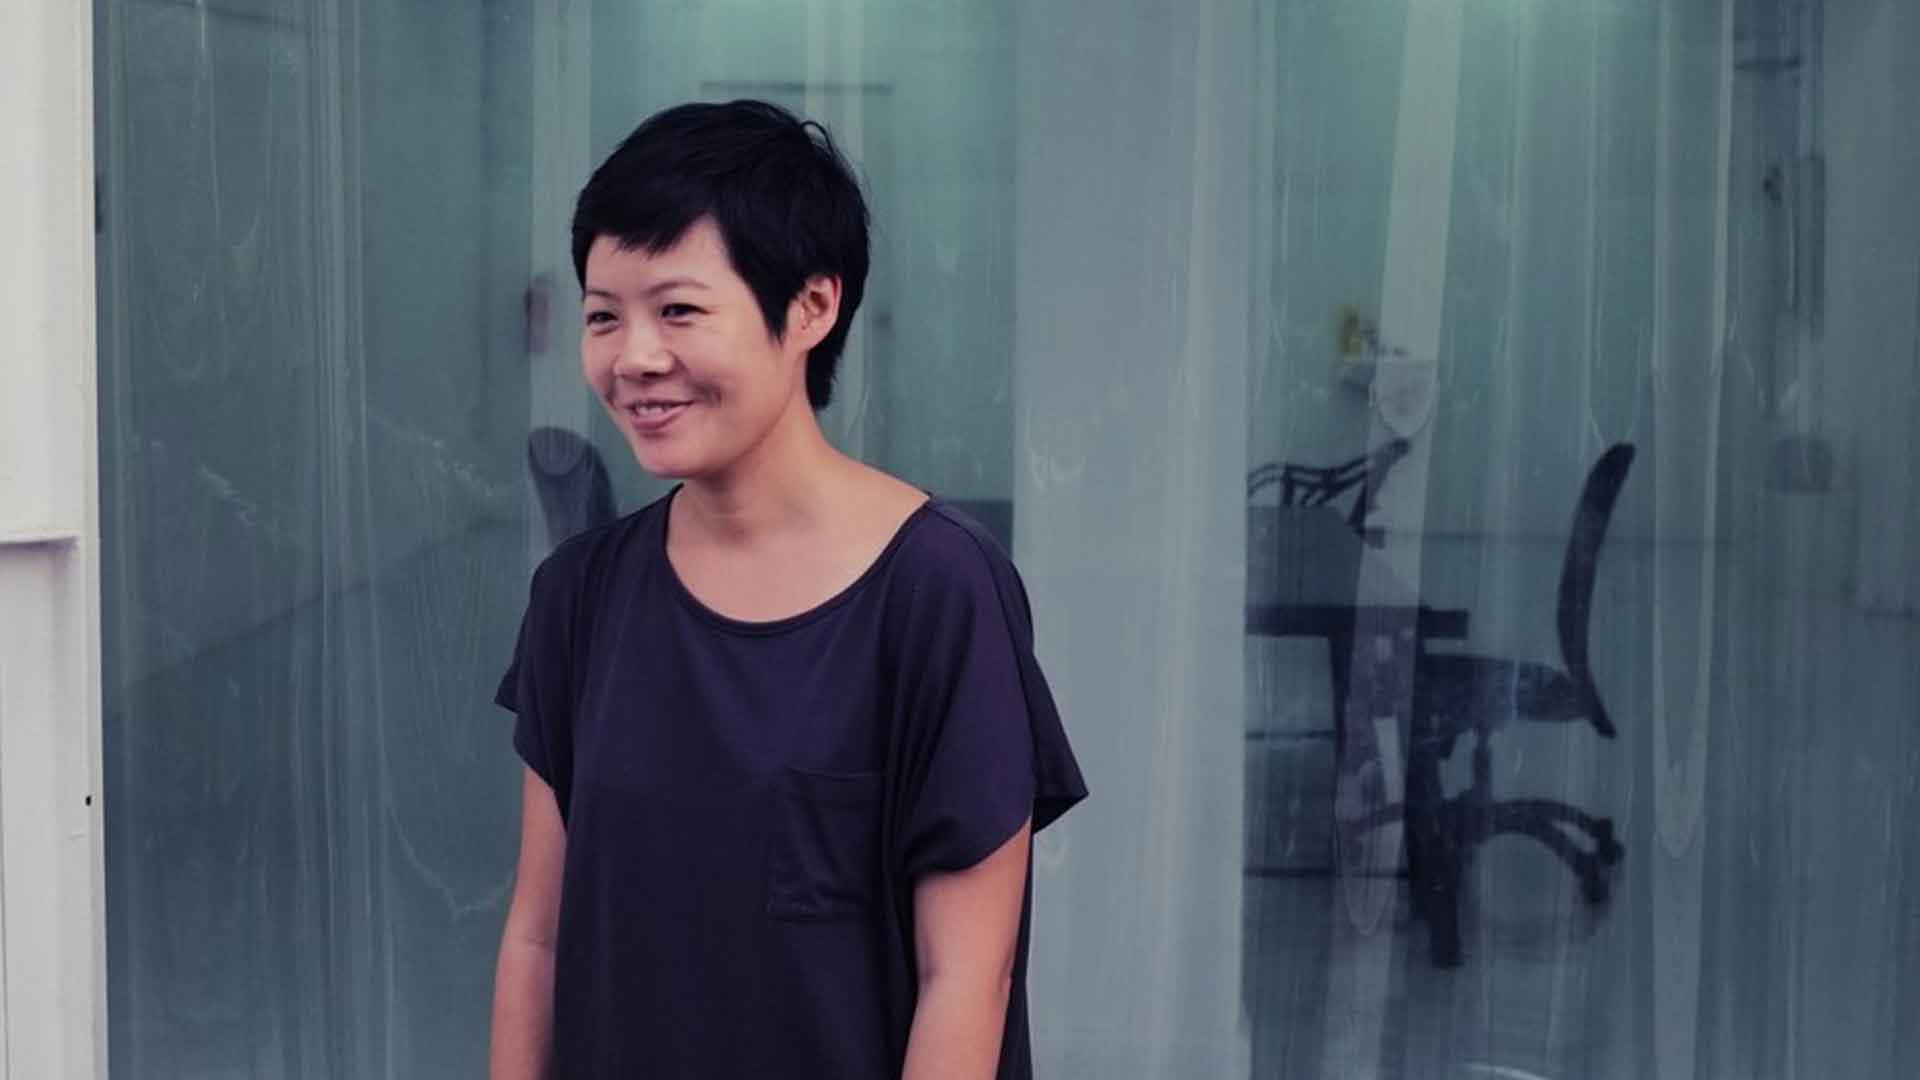 Focus 2017 // Anocha Suwichakornpong